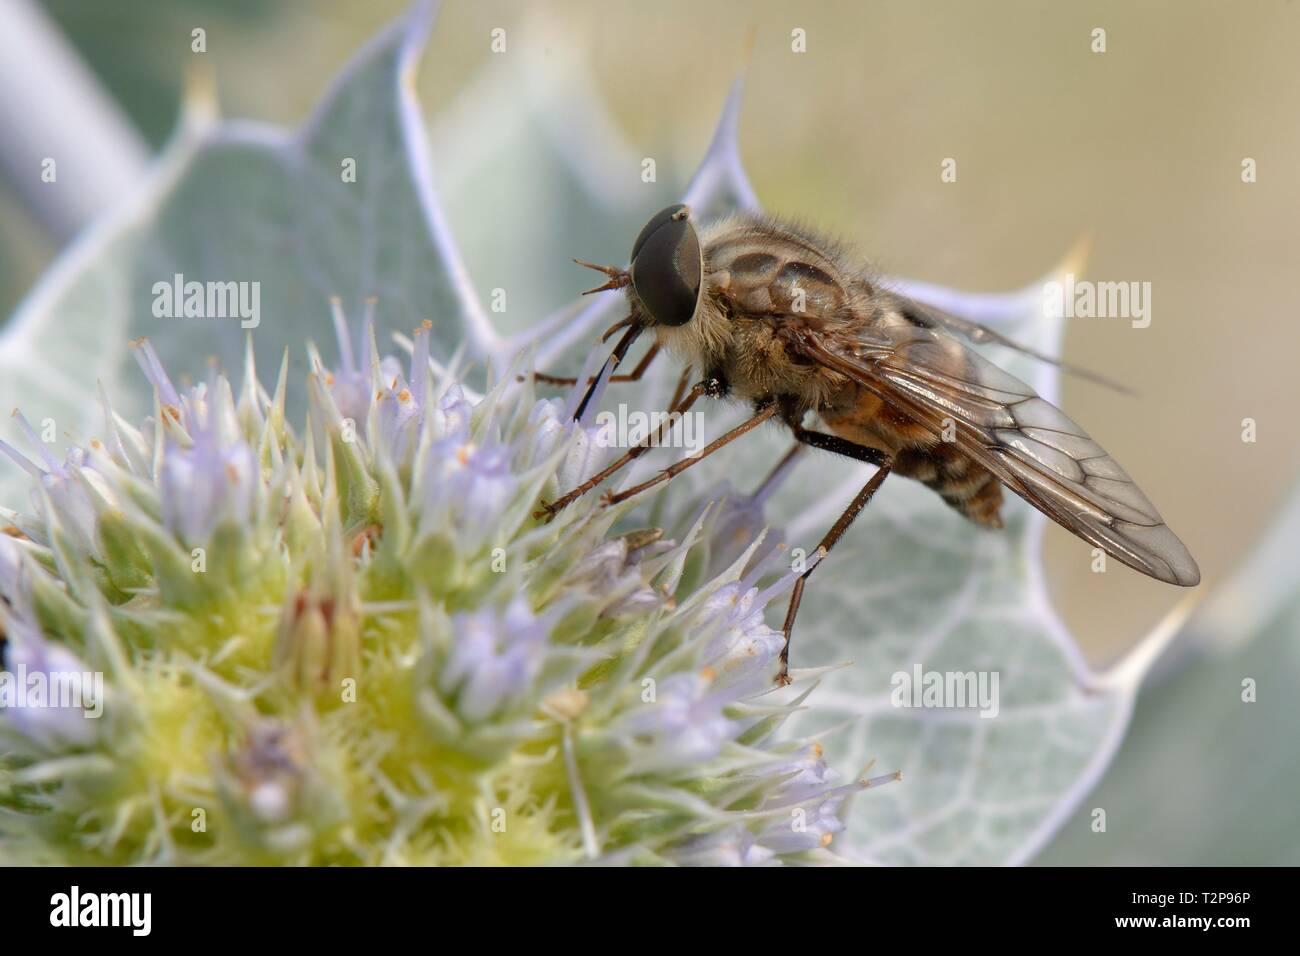 A strictly nectar-feeding Horse fly (Pangonius striatus), endemic to Sardinia, feeding on Sea holly flowers (Eryngium maritimum) on a beach, Sardinia, - Stock Image